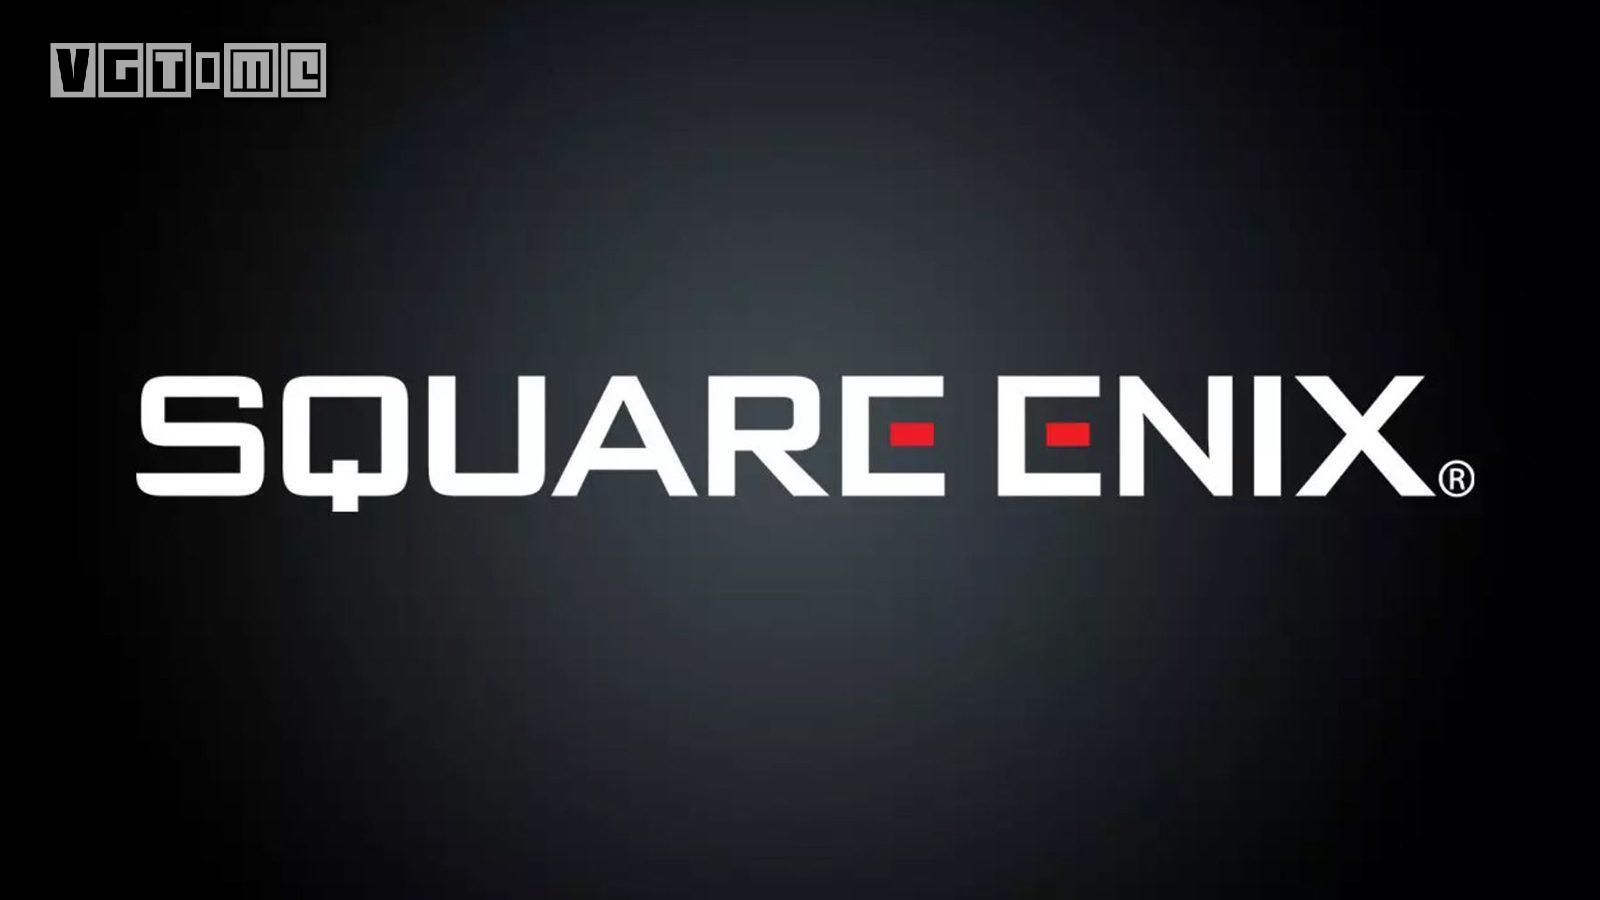 Square Enix正开发全新IP 旨在创造次世代的动作游戏体验。